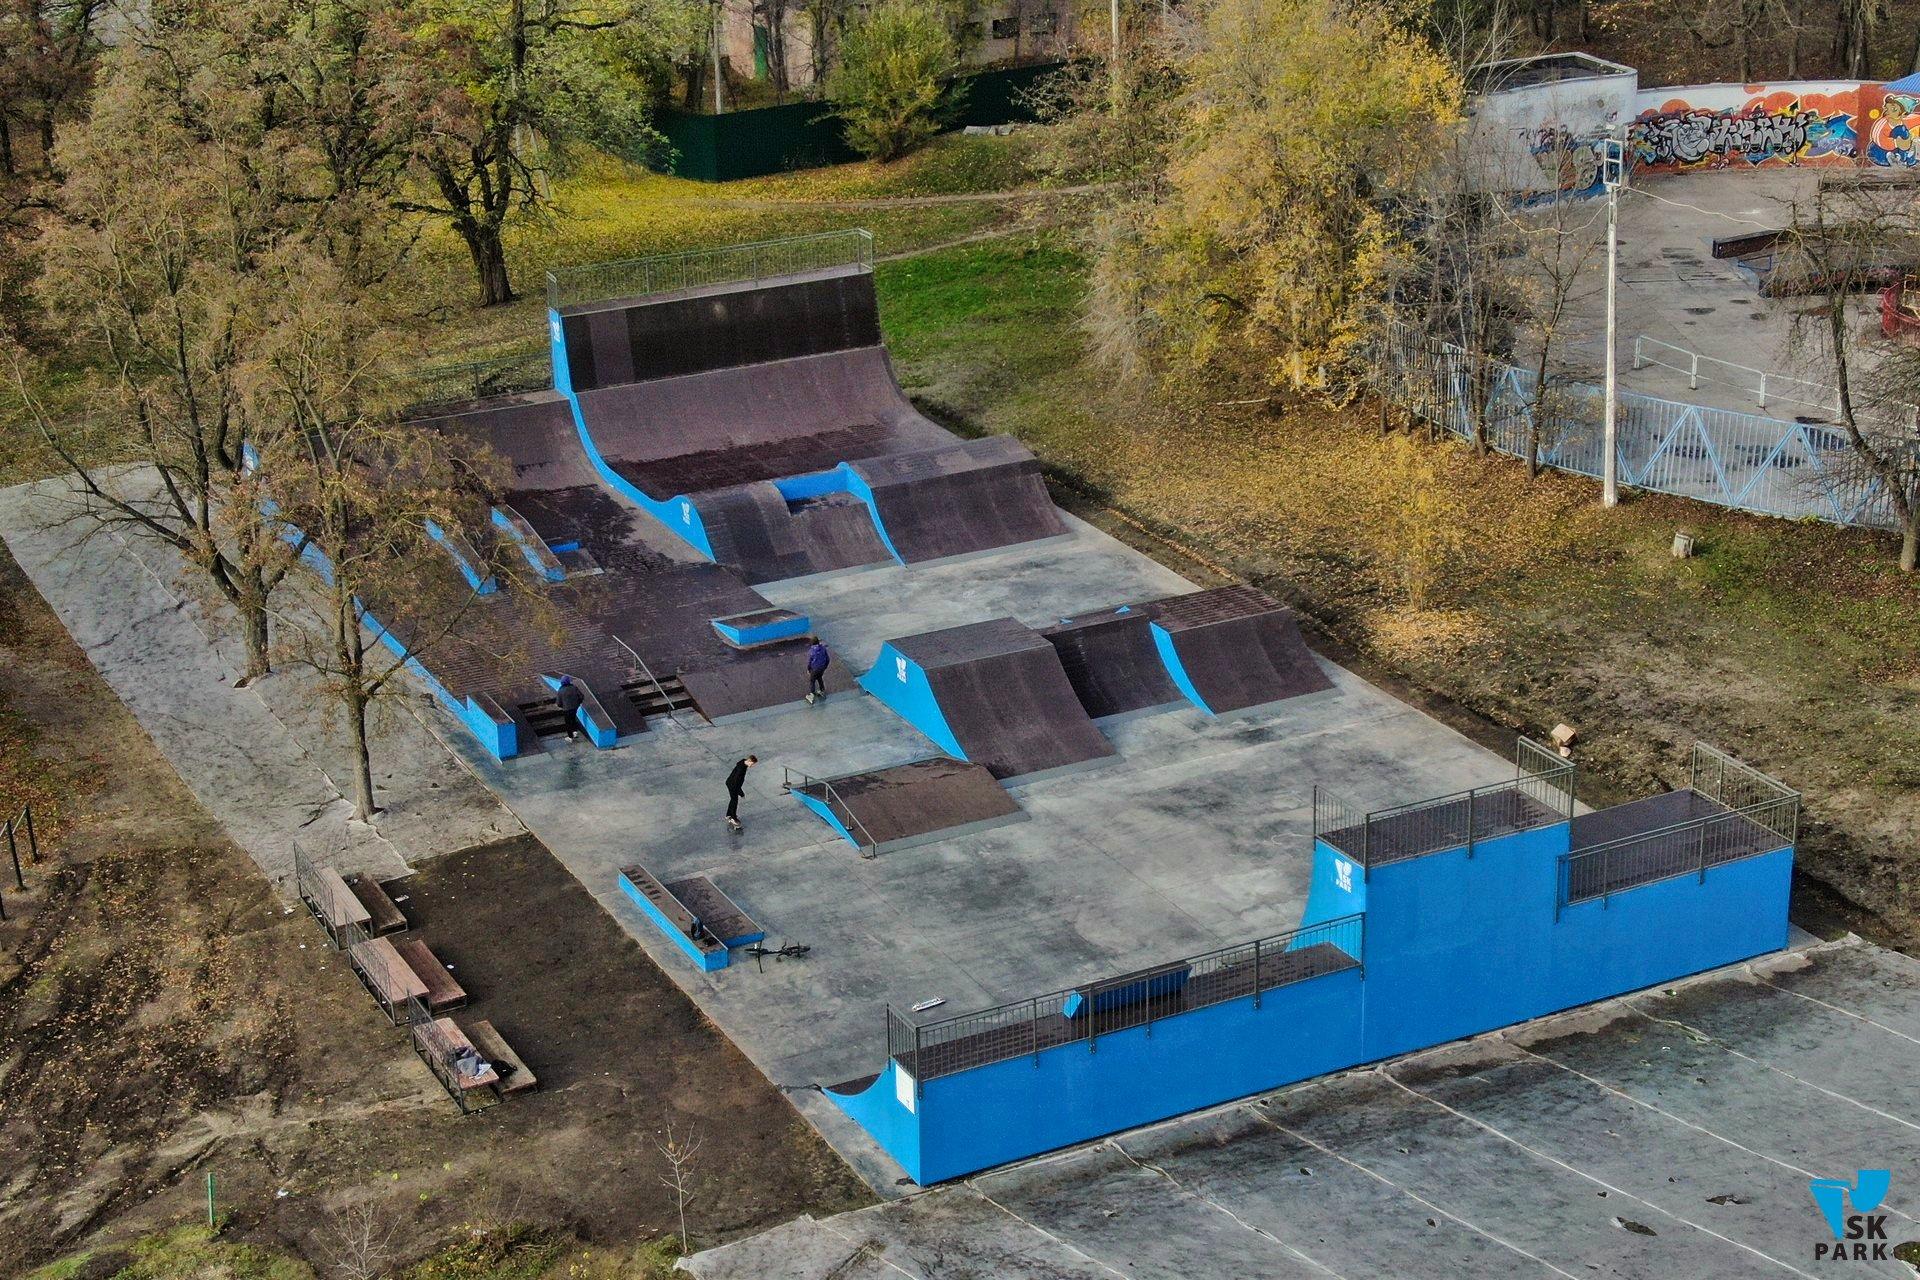 Универсальный скейт парк в Белгороде / Universal skate park in Belgorod by SK Park